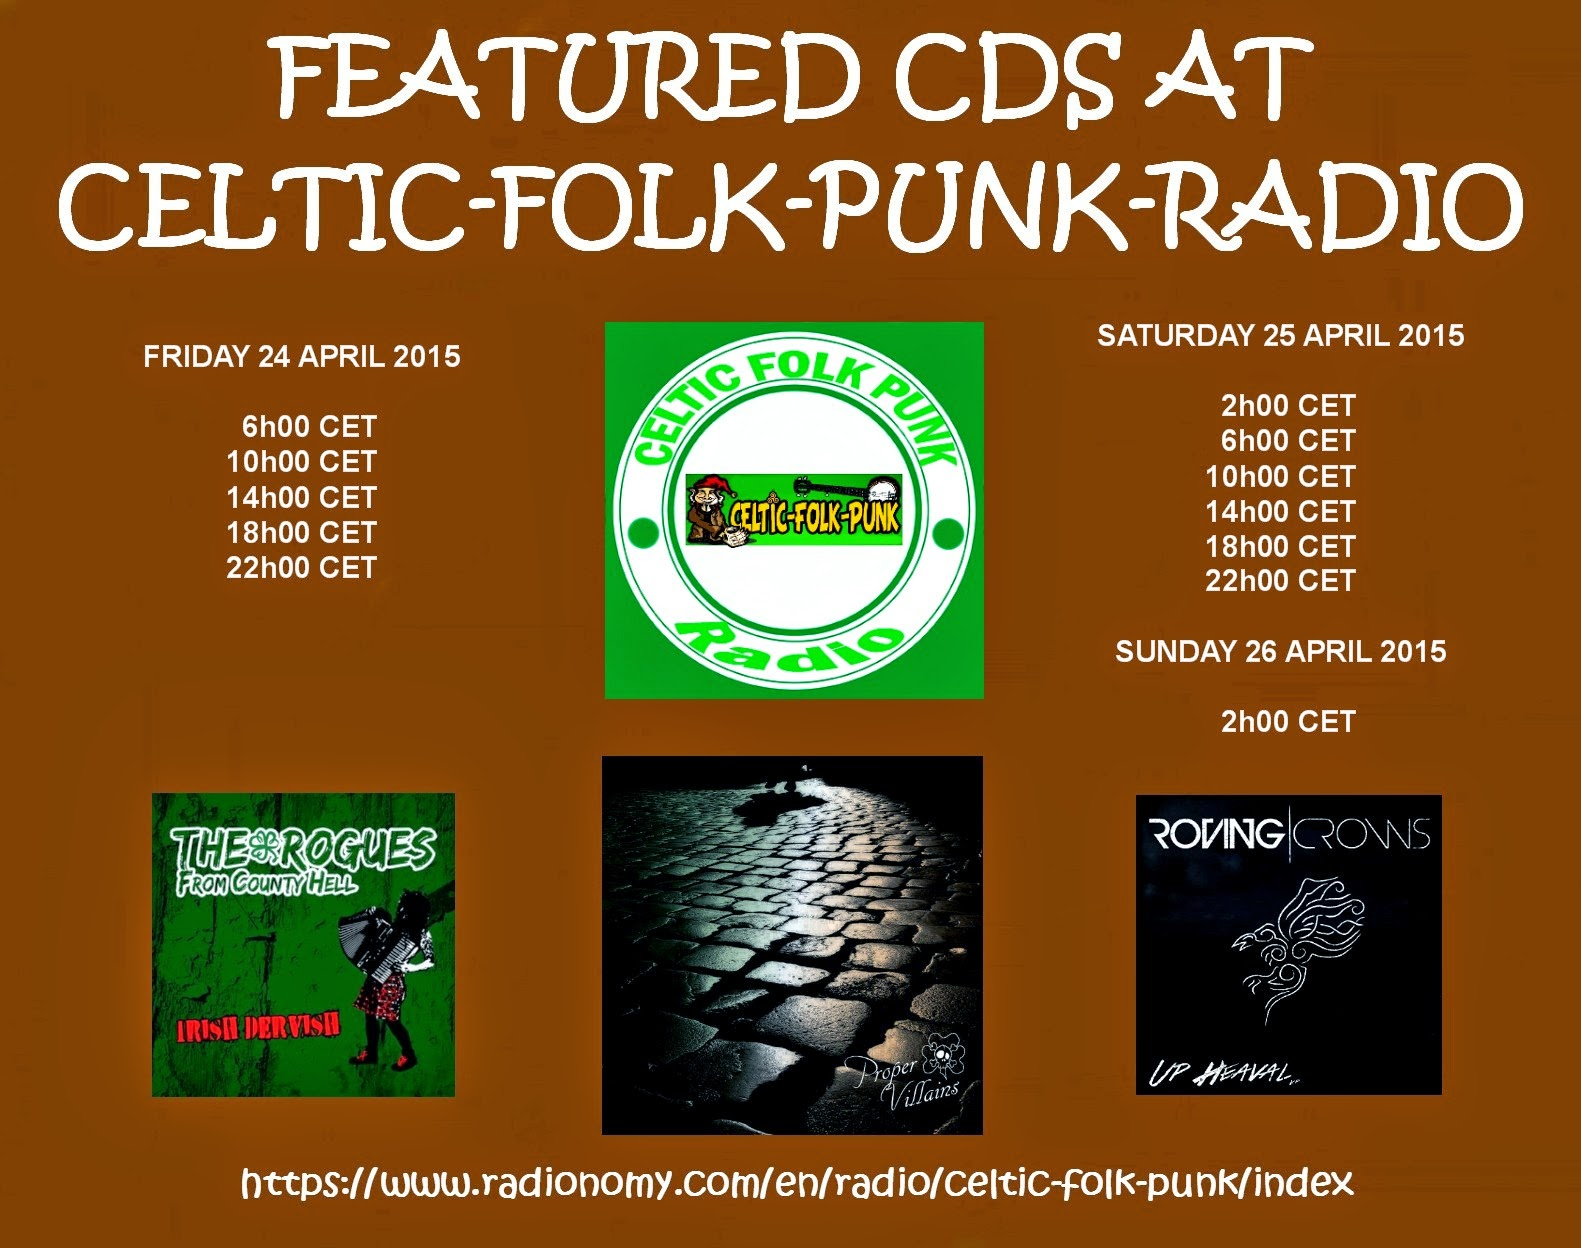 FEATURED ALBUMS AT CELTIC-FOLK-PUNK RADIO (24-26 APRIL ...